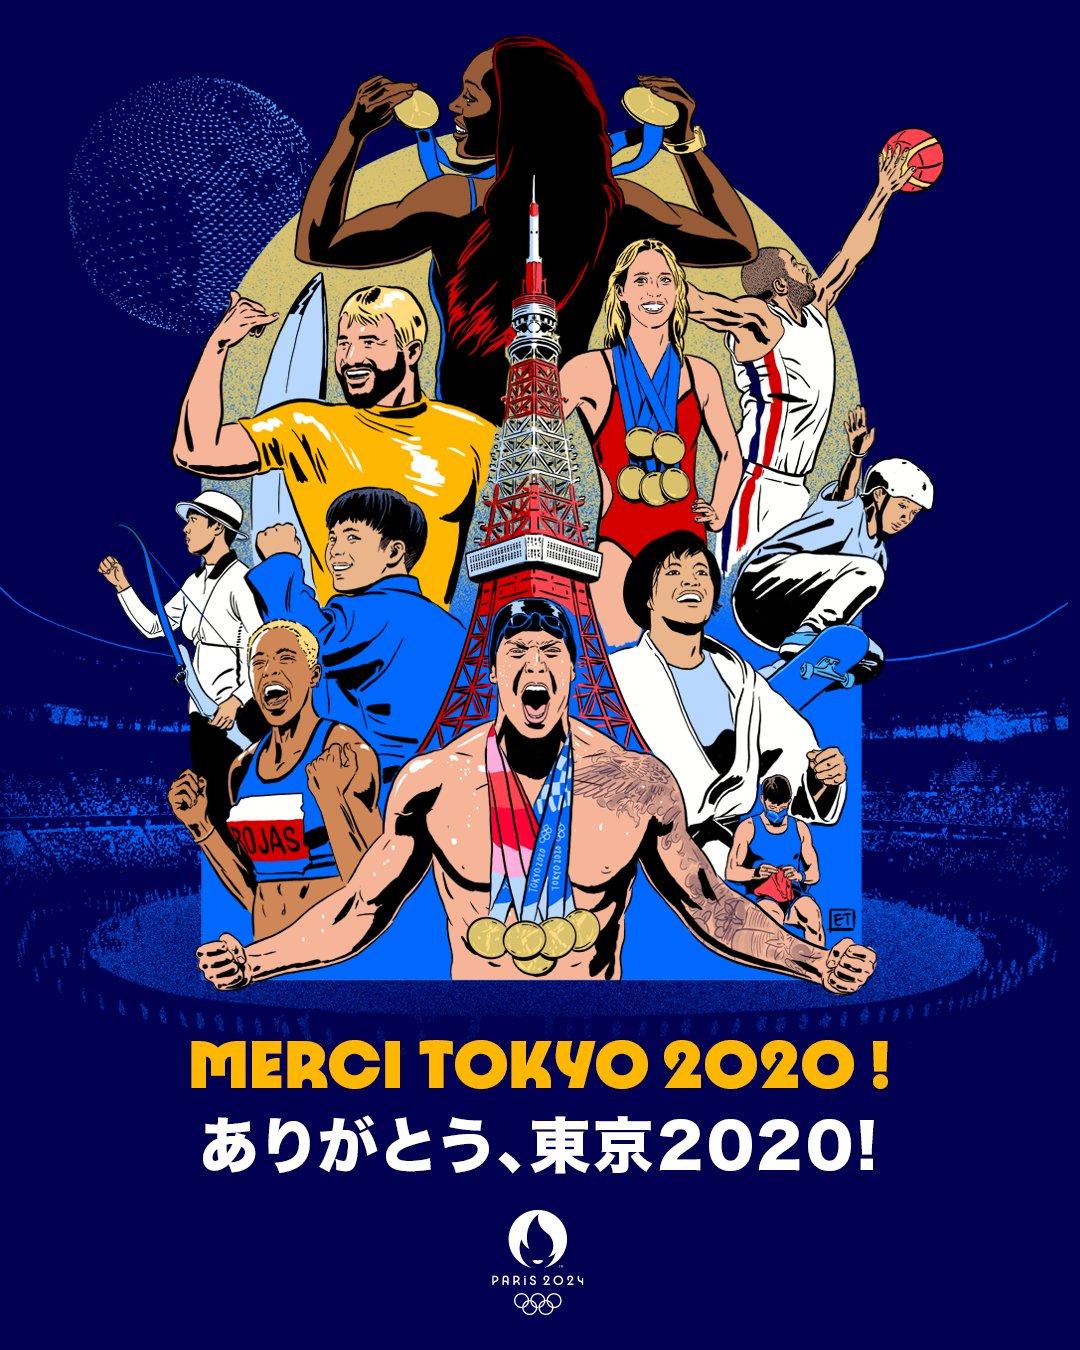 Merci Tokyo 2020